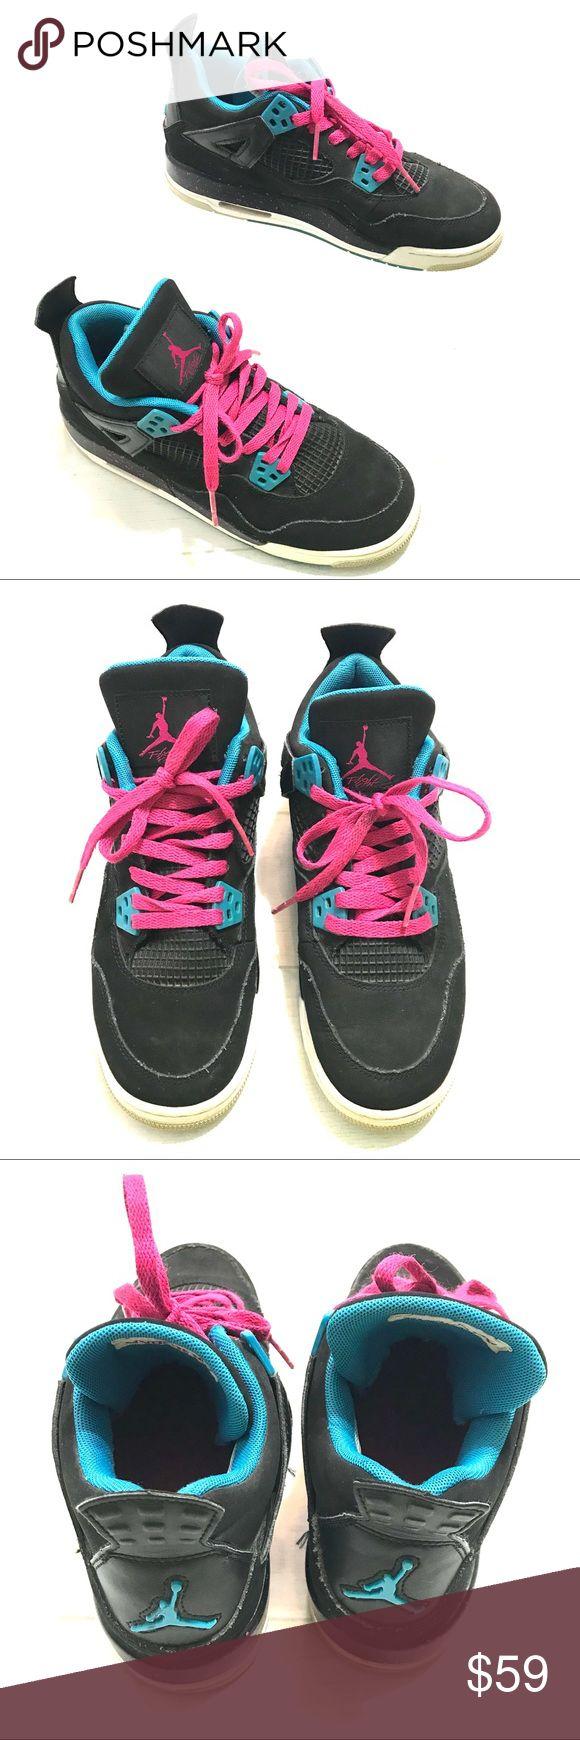 Air Jordan 4 Retro GS Black Vivid Pink Blue 5.5Y Air